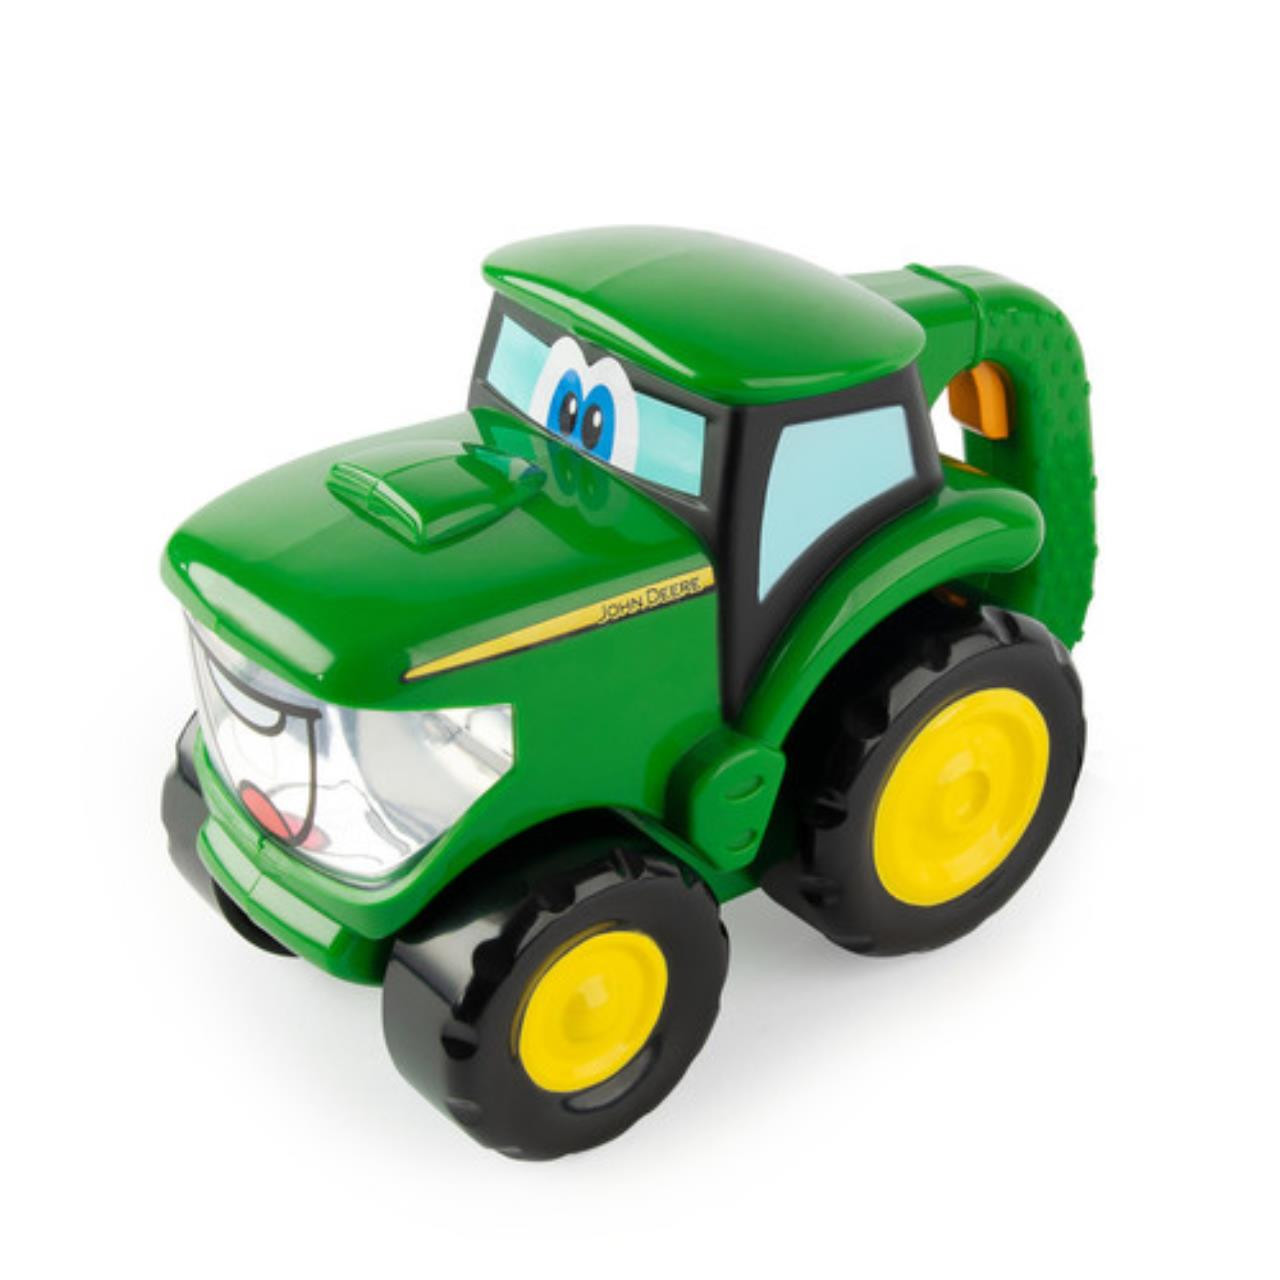 Johnny traktor lommelygte